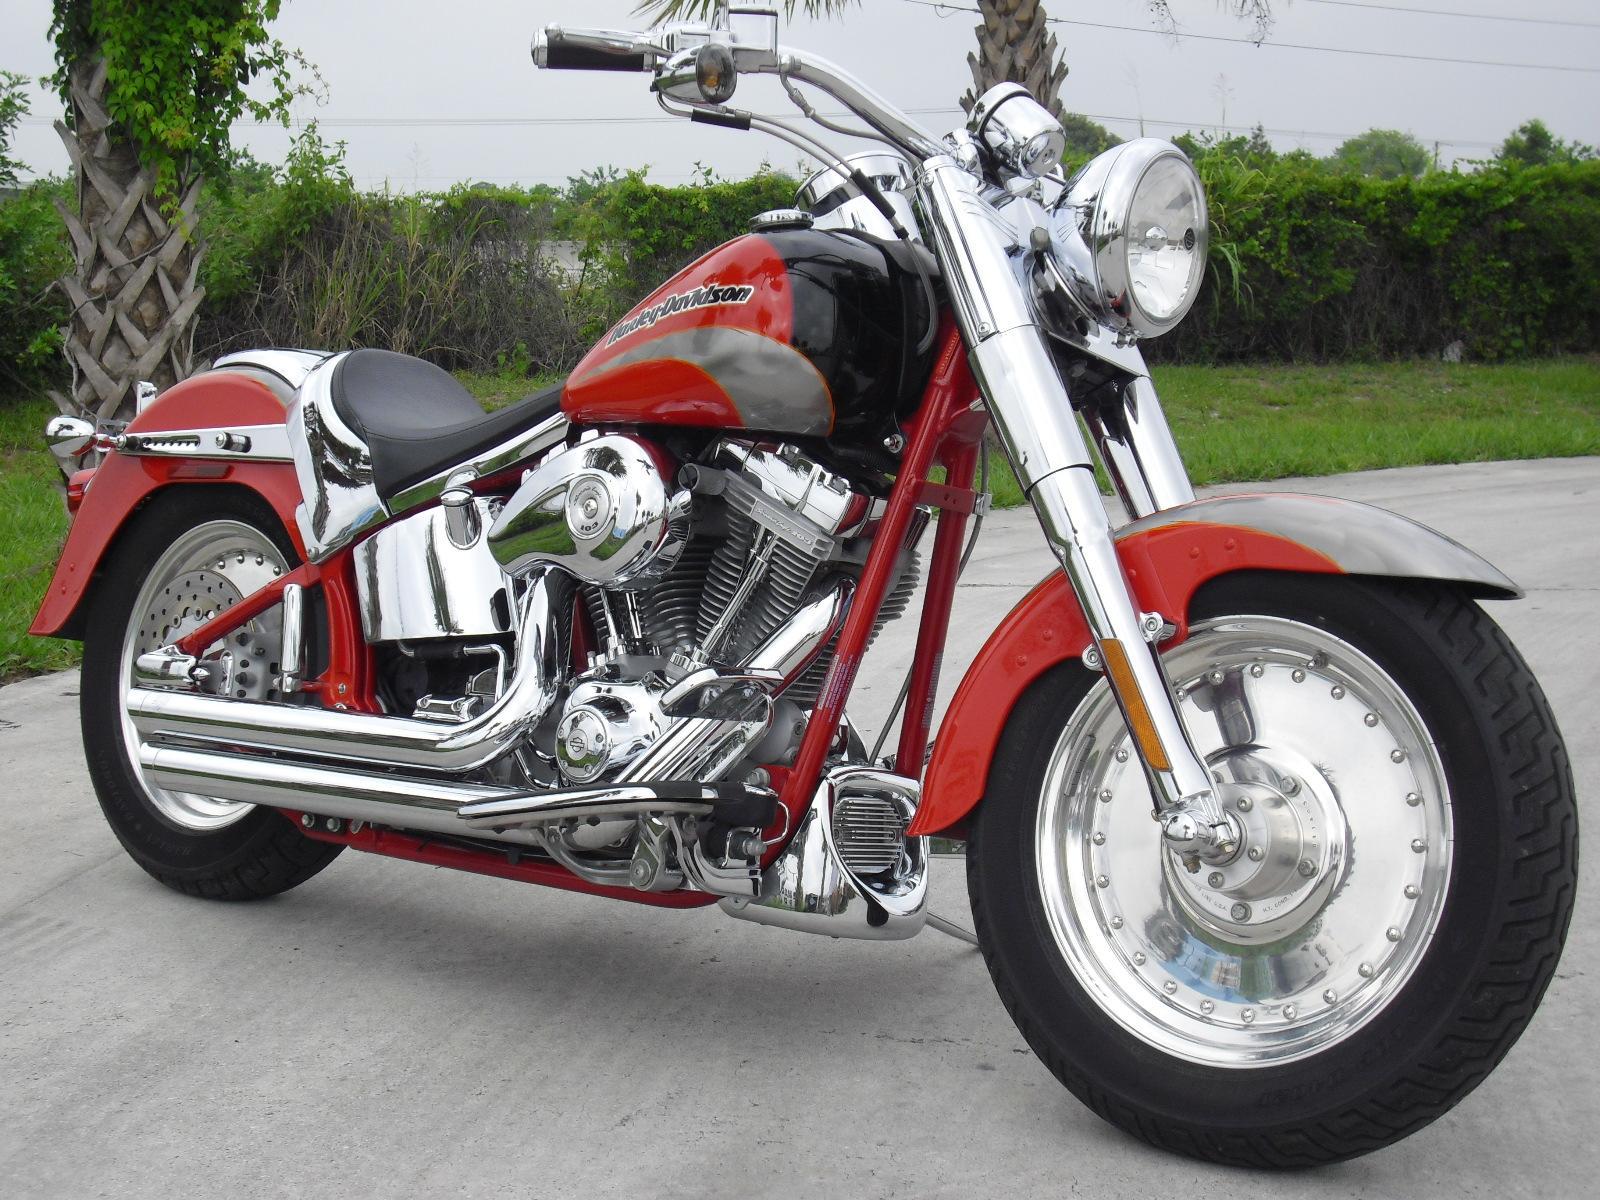 Harley-Davidson wallpapers HD quality